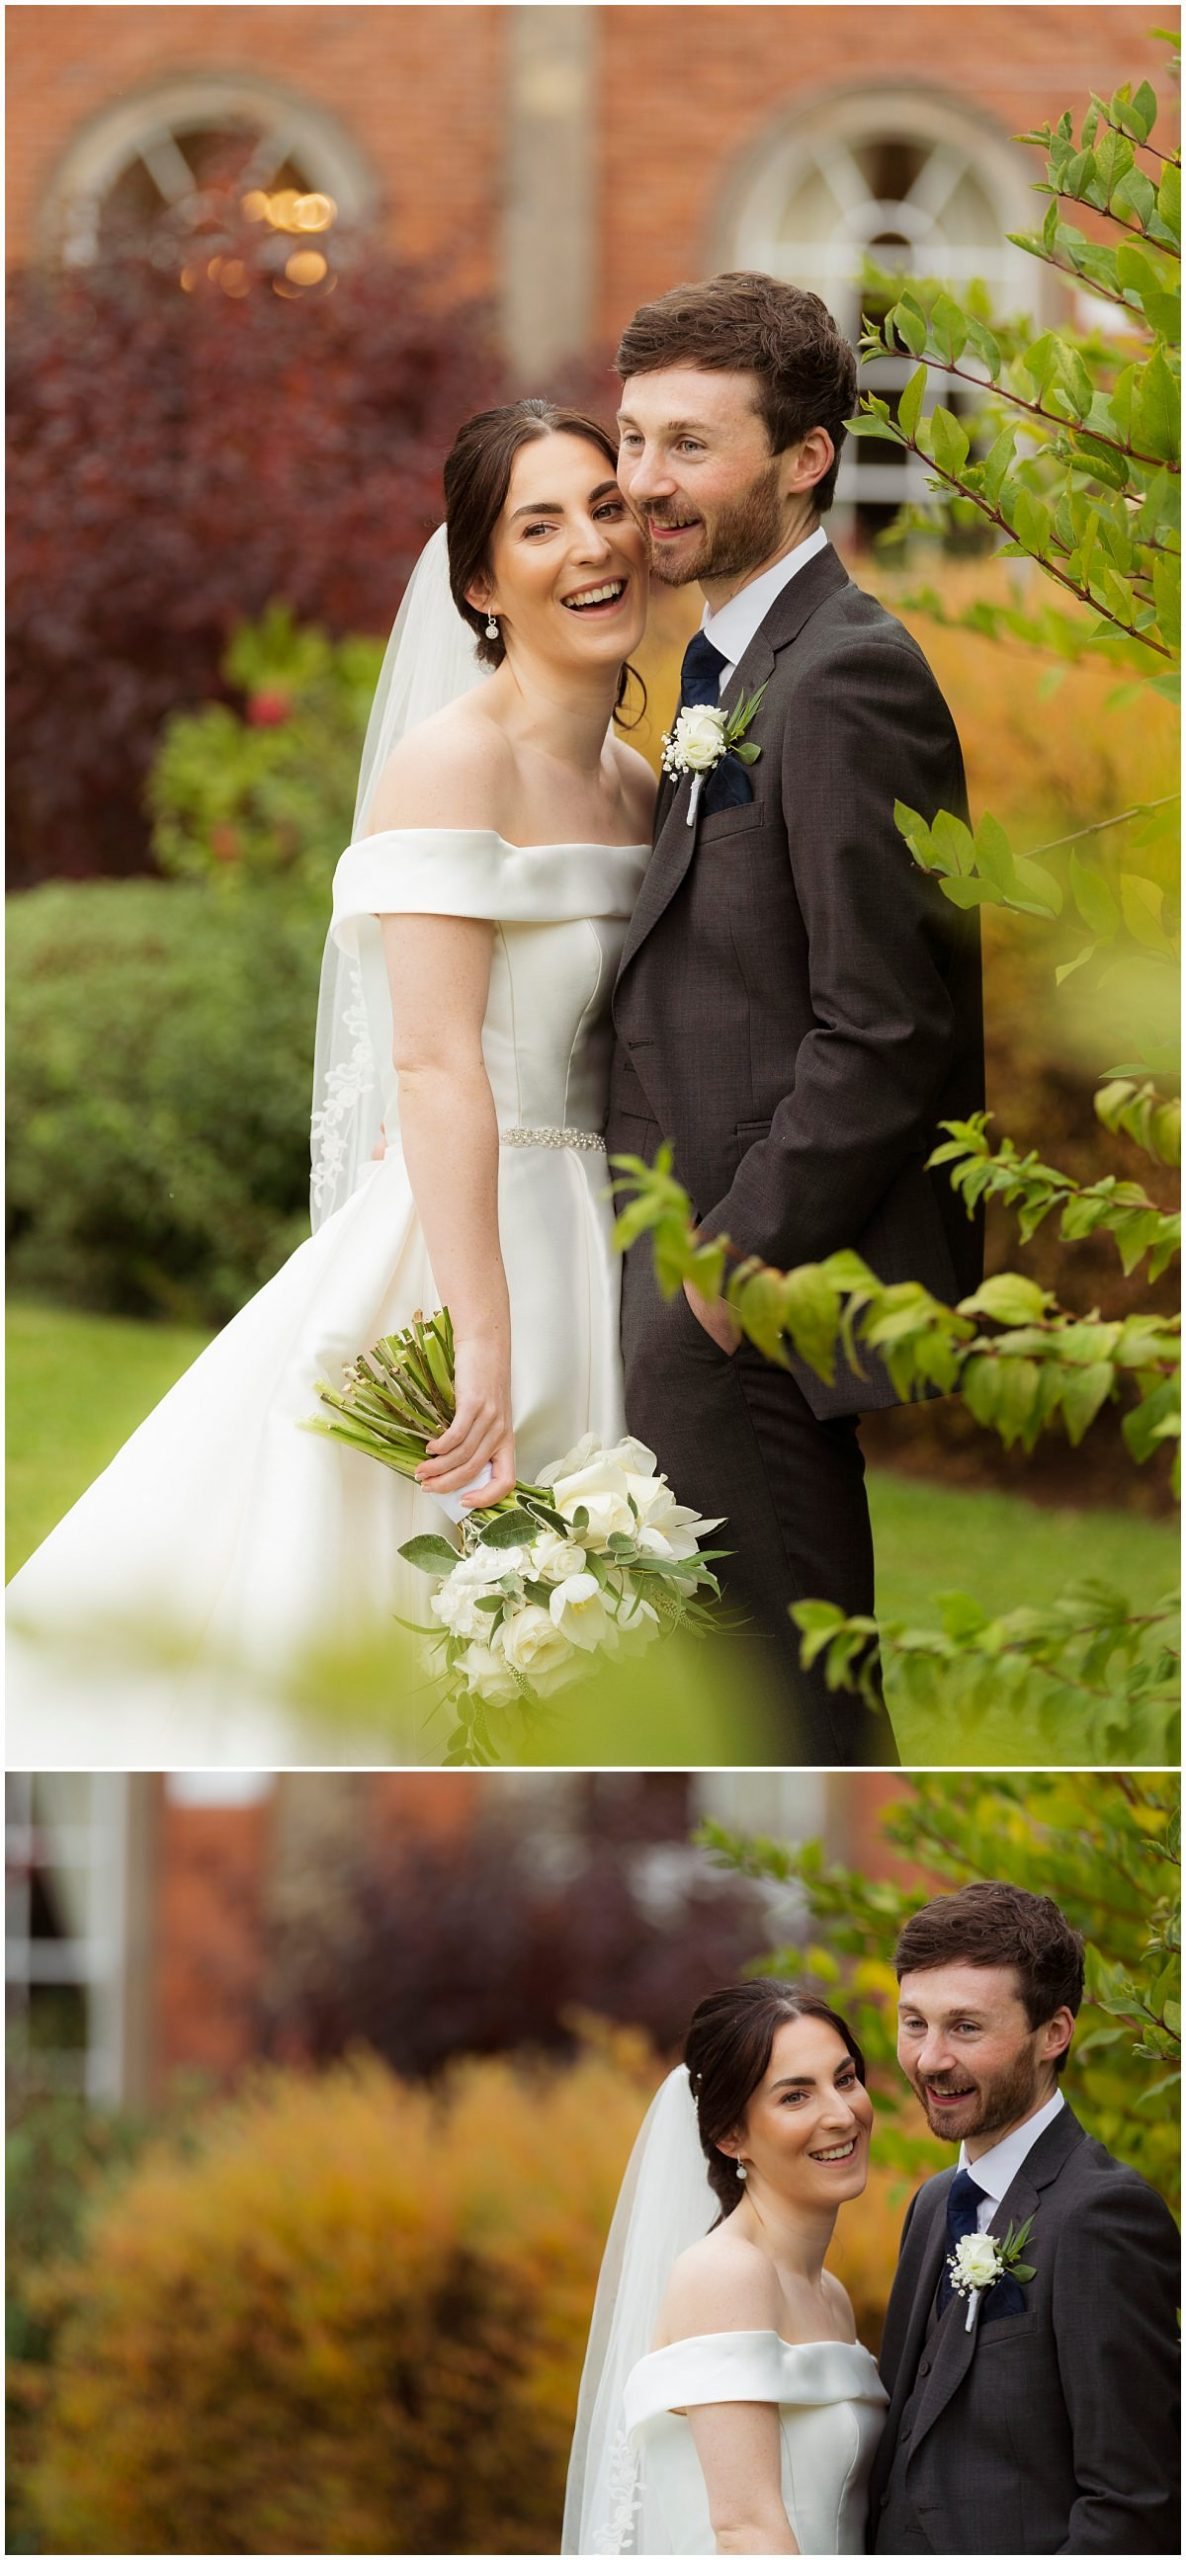 Wedding at Colwick Hall